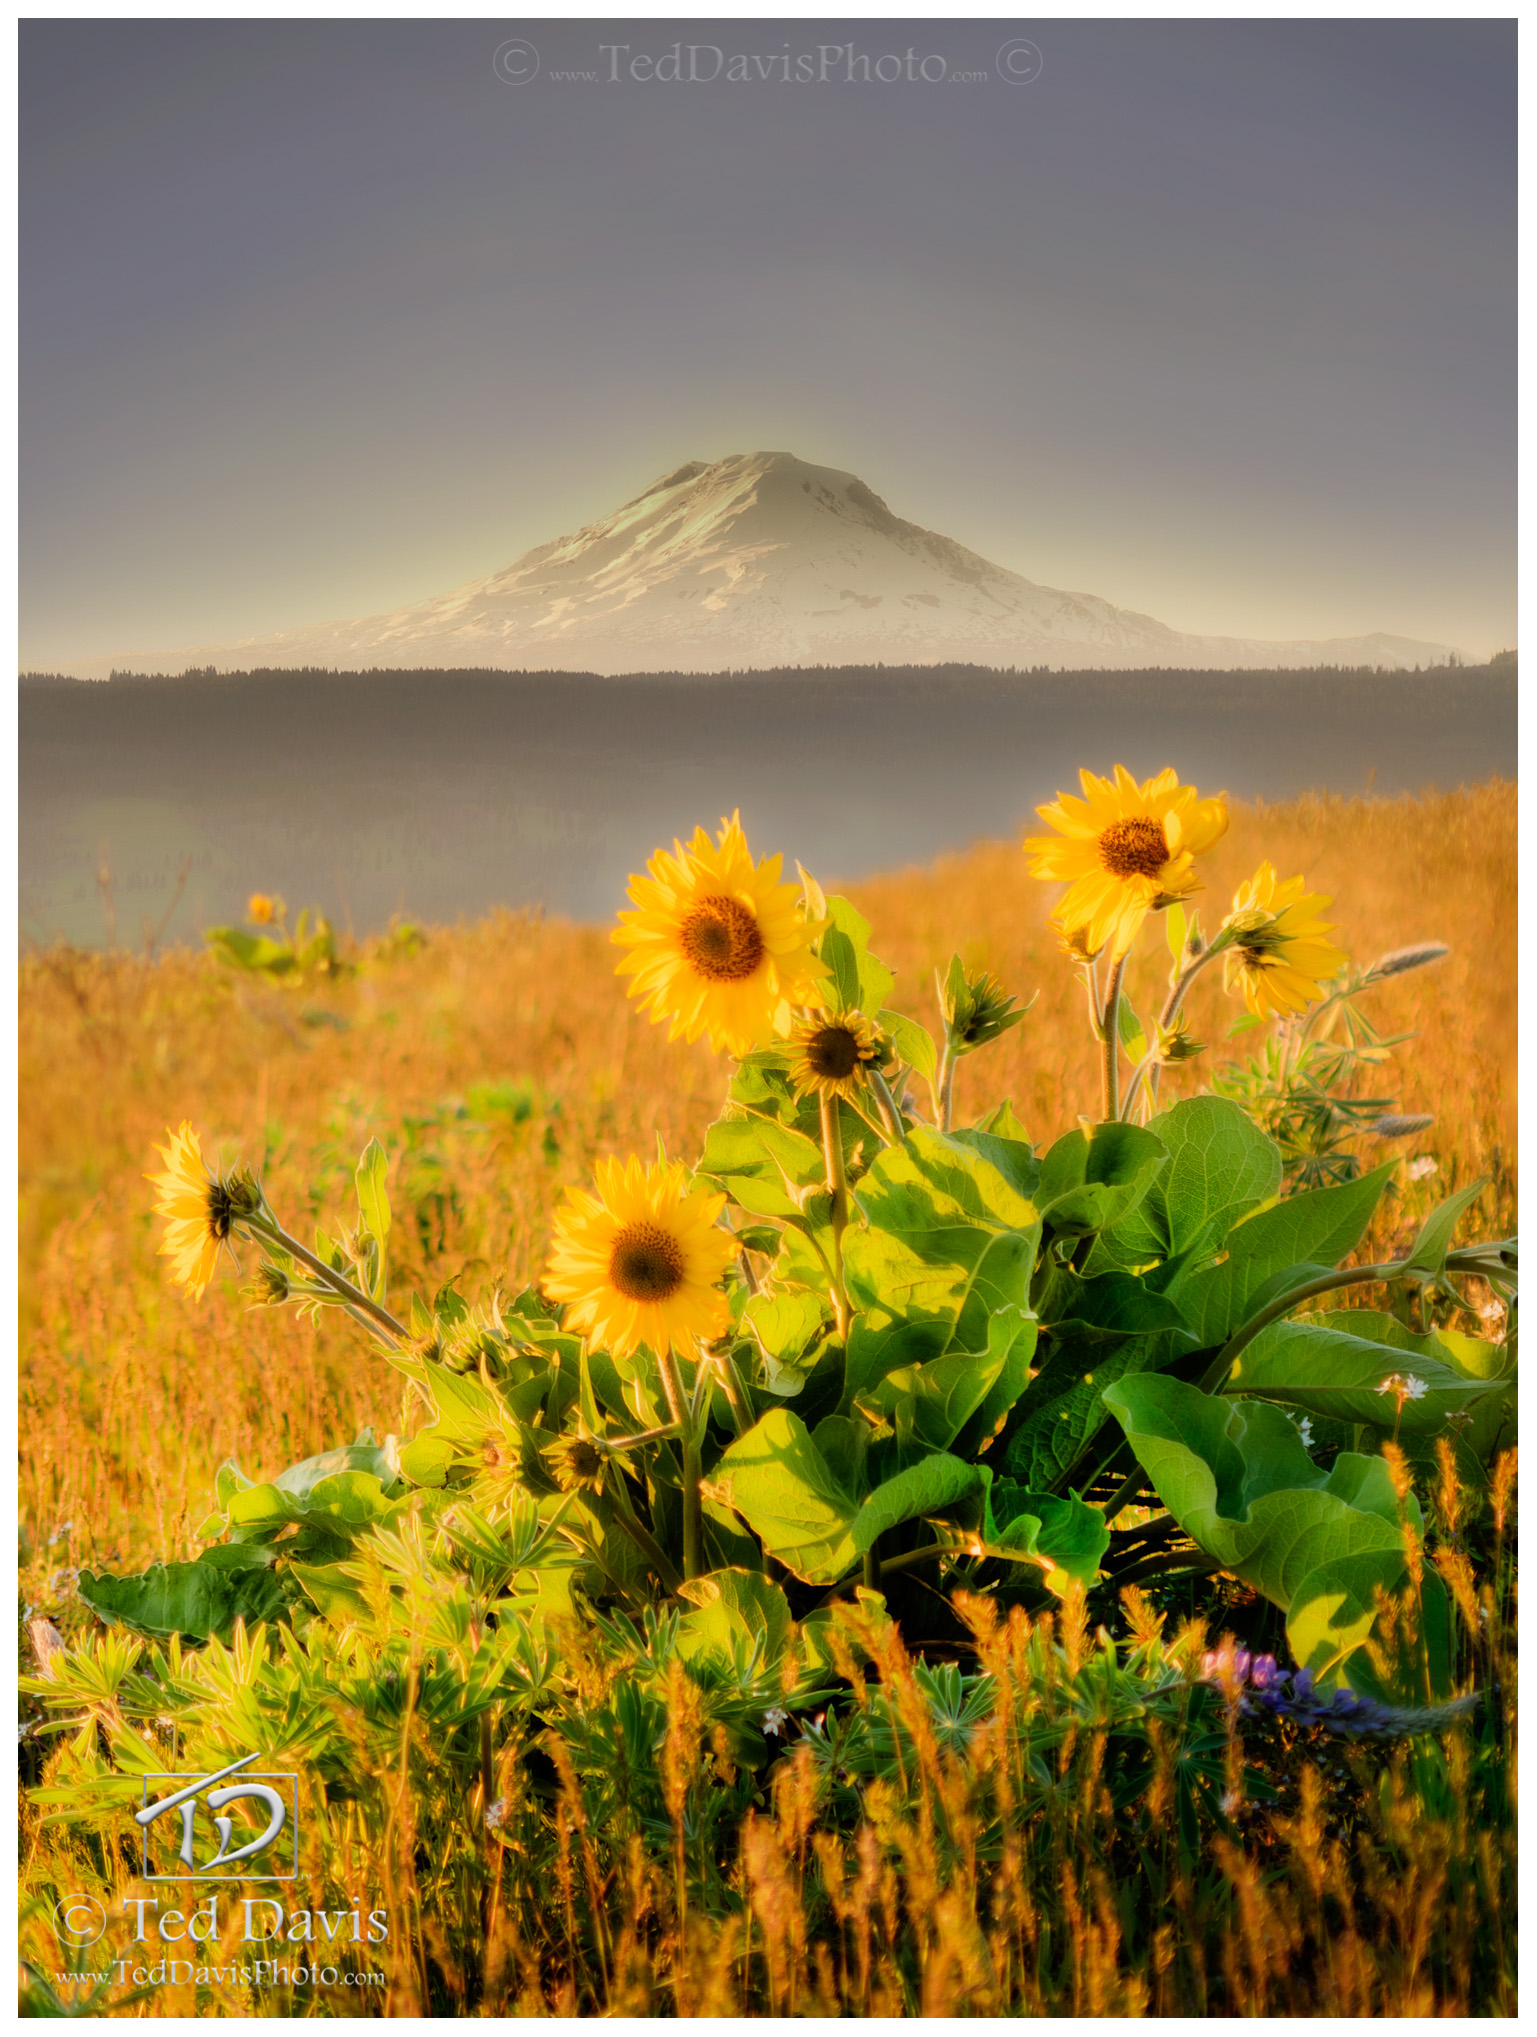 oregon, mt hood, hood, breeze, flowers, hill, relax, horizon, yellow, arrowleaf, golden, sunset, photo